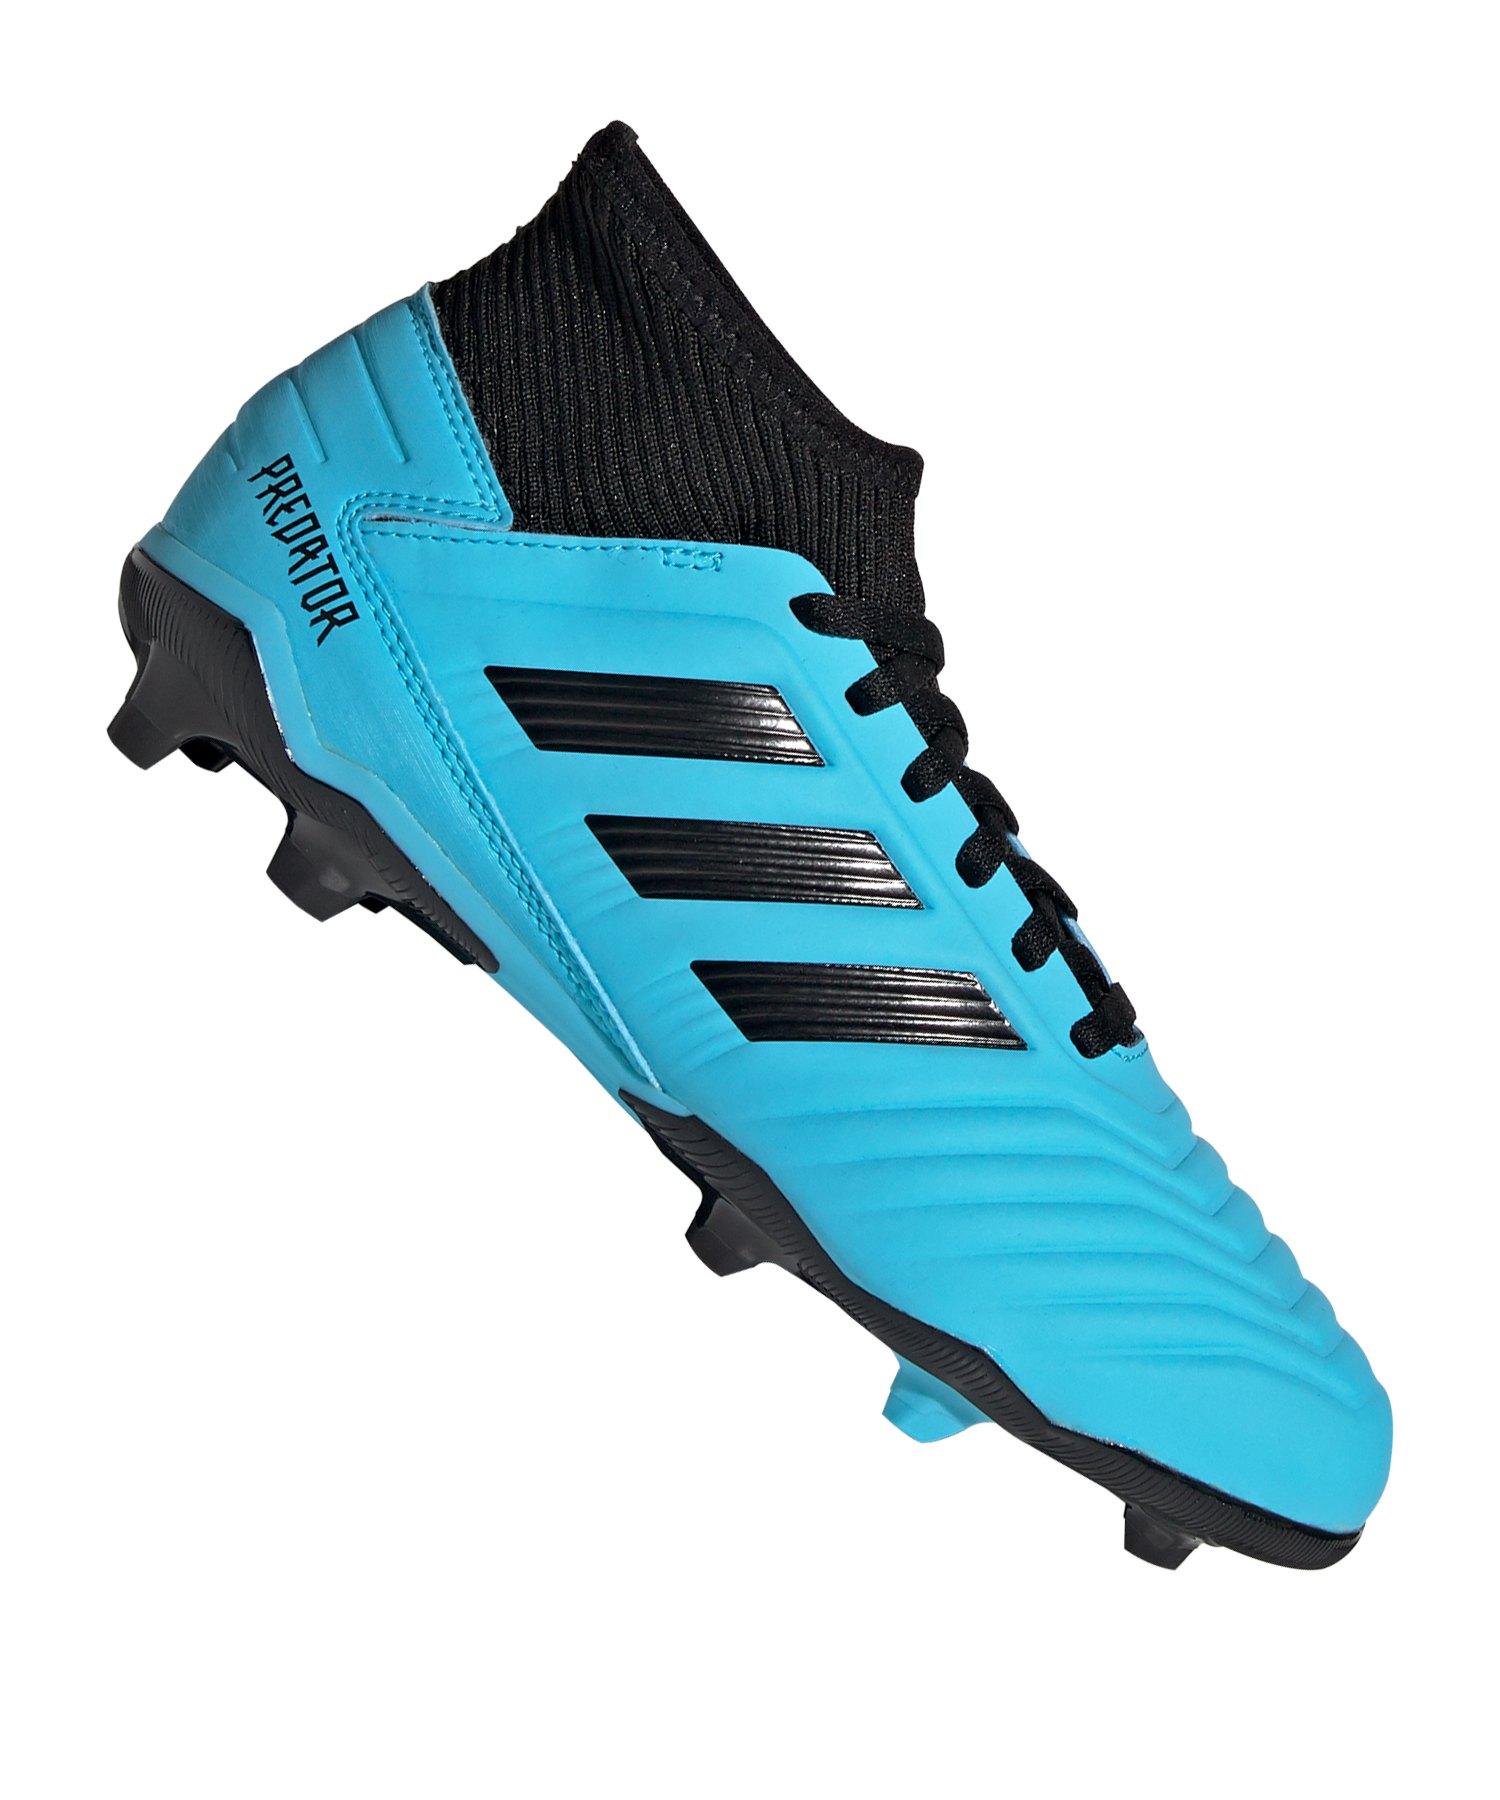 adidas Predator 19.3 FG J Kids Blau Schwarz - blau